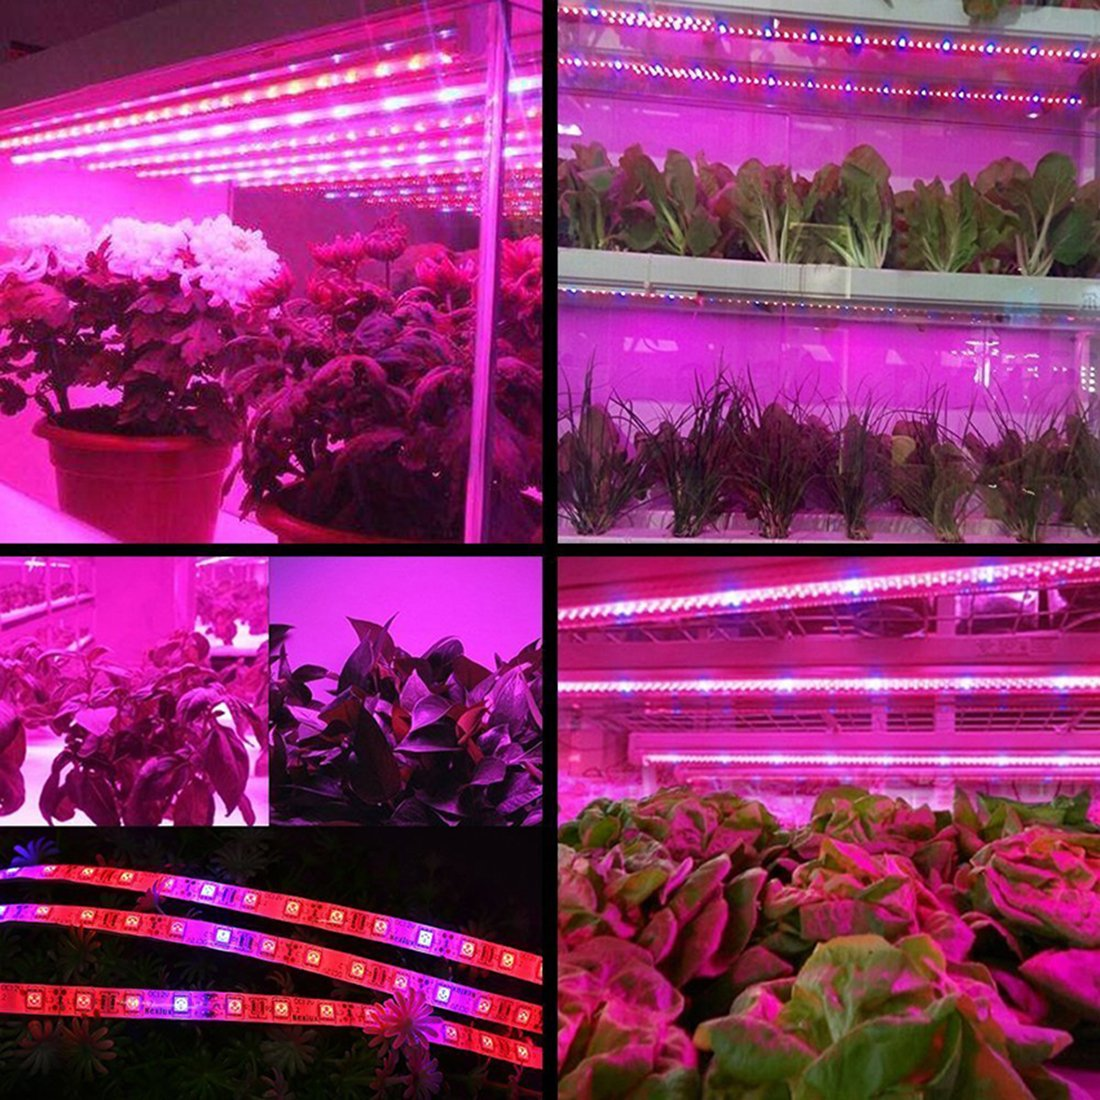 PINCHU LED Plant Grow Lights 1M 2M 3M 4M 5M SMD 5050 DC12V Flexible LED Grow Strip Light For Greenhouse Hydroponics Plant Vegetable,3Red1blue,1M